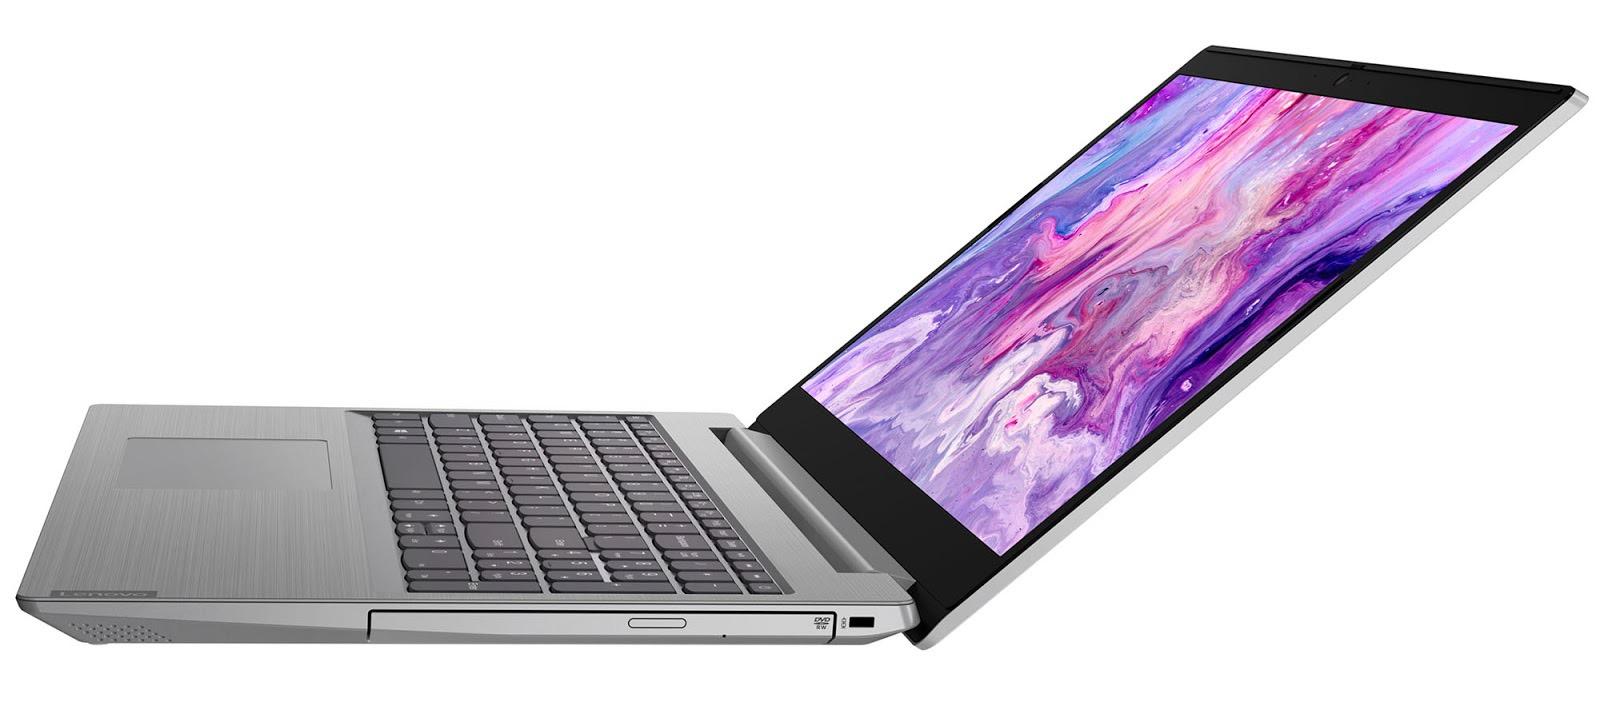 Фото 3. Ноутбук Lenovo ideapad L3 15IML05 Platinum Grey (81Y300NDRE)